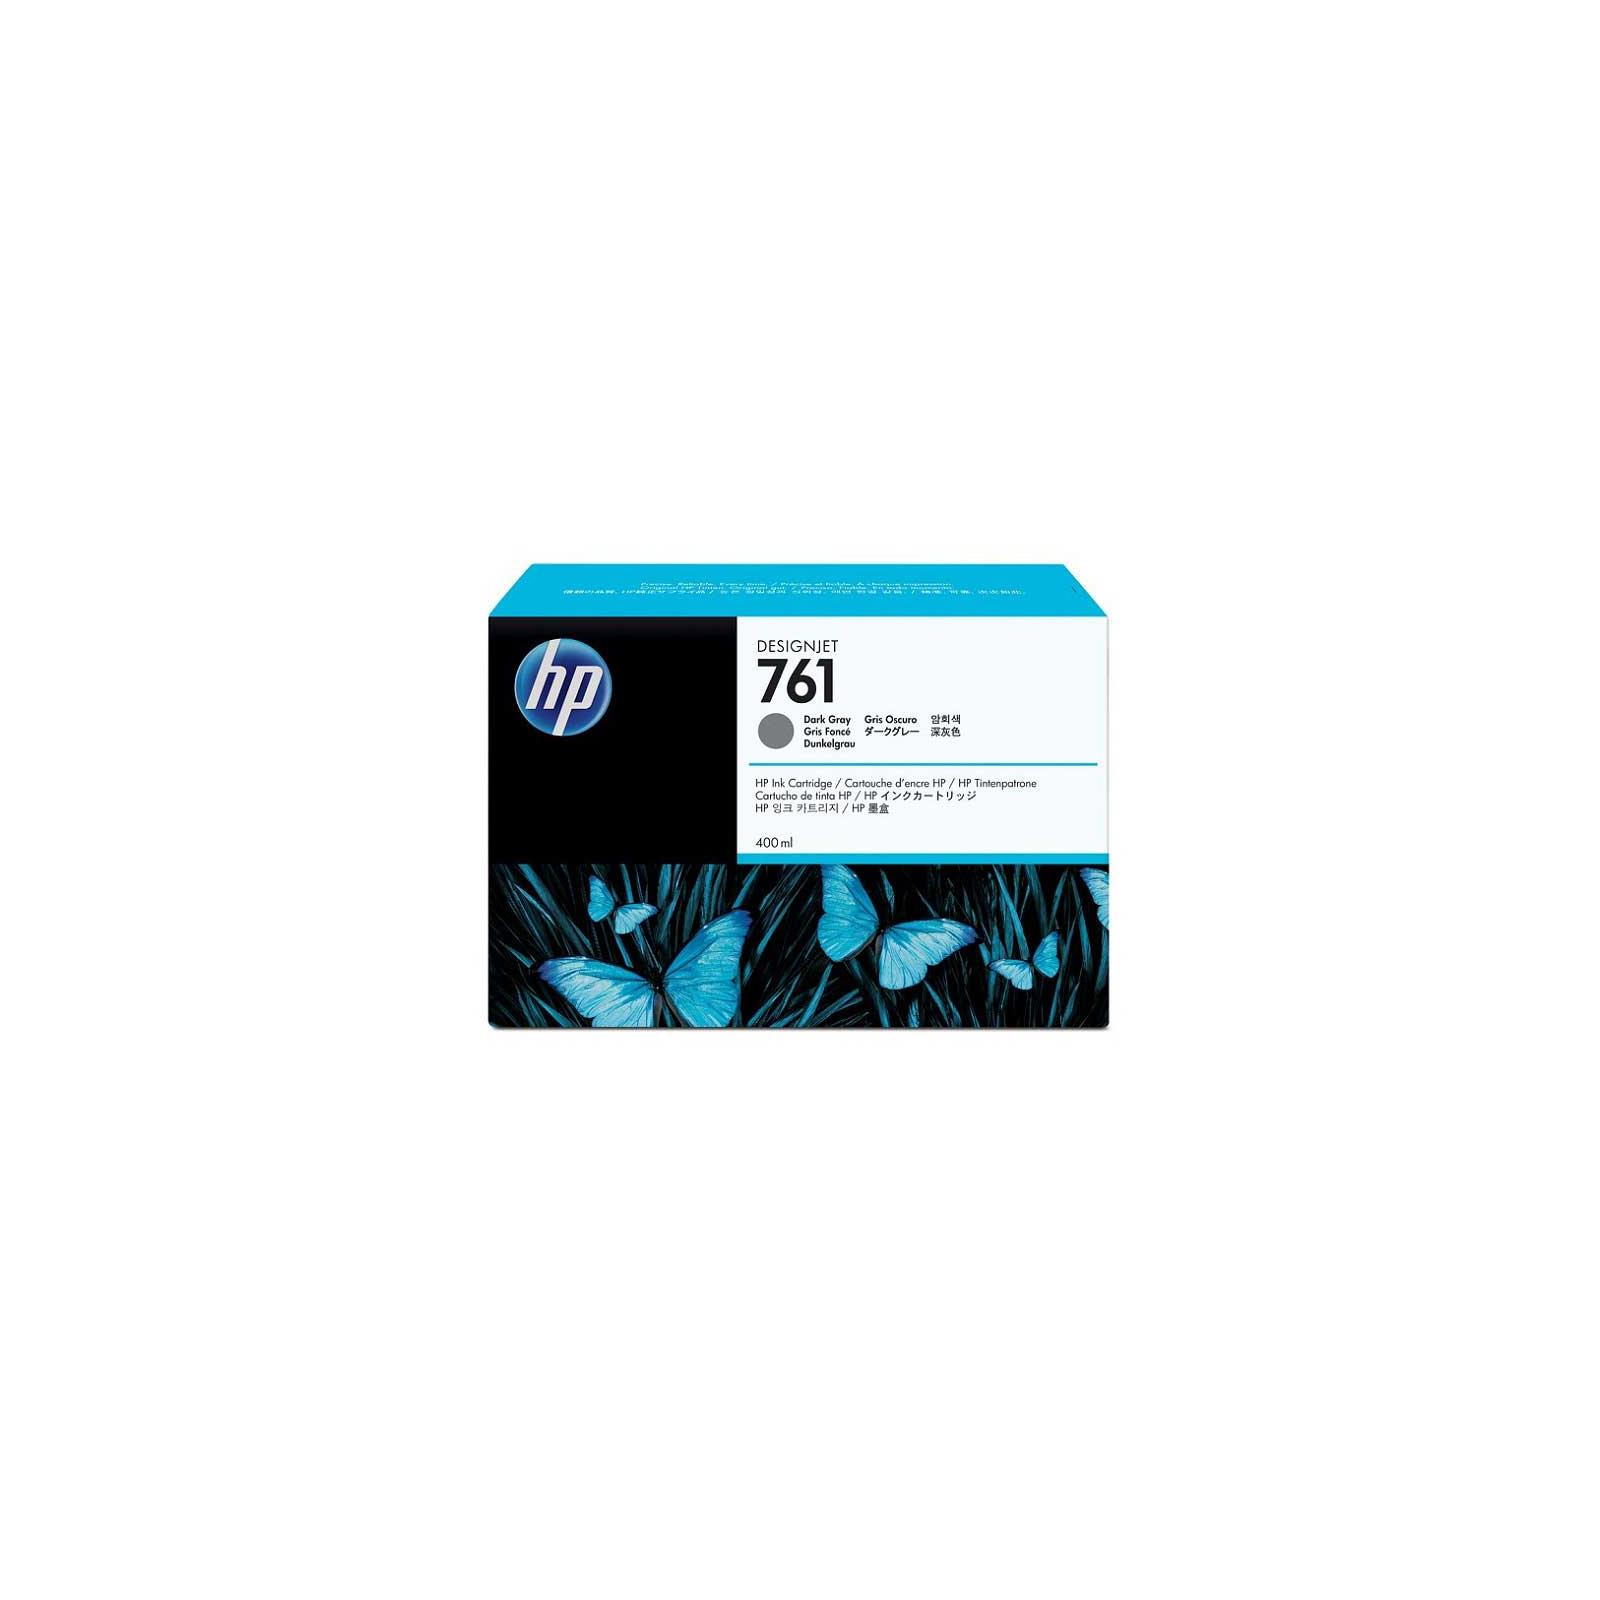 Картридж HP DJ No.761 DesignJet T7100 dark gray (CM996A)